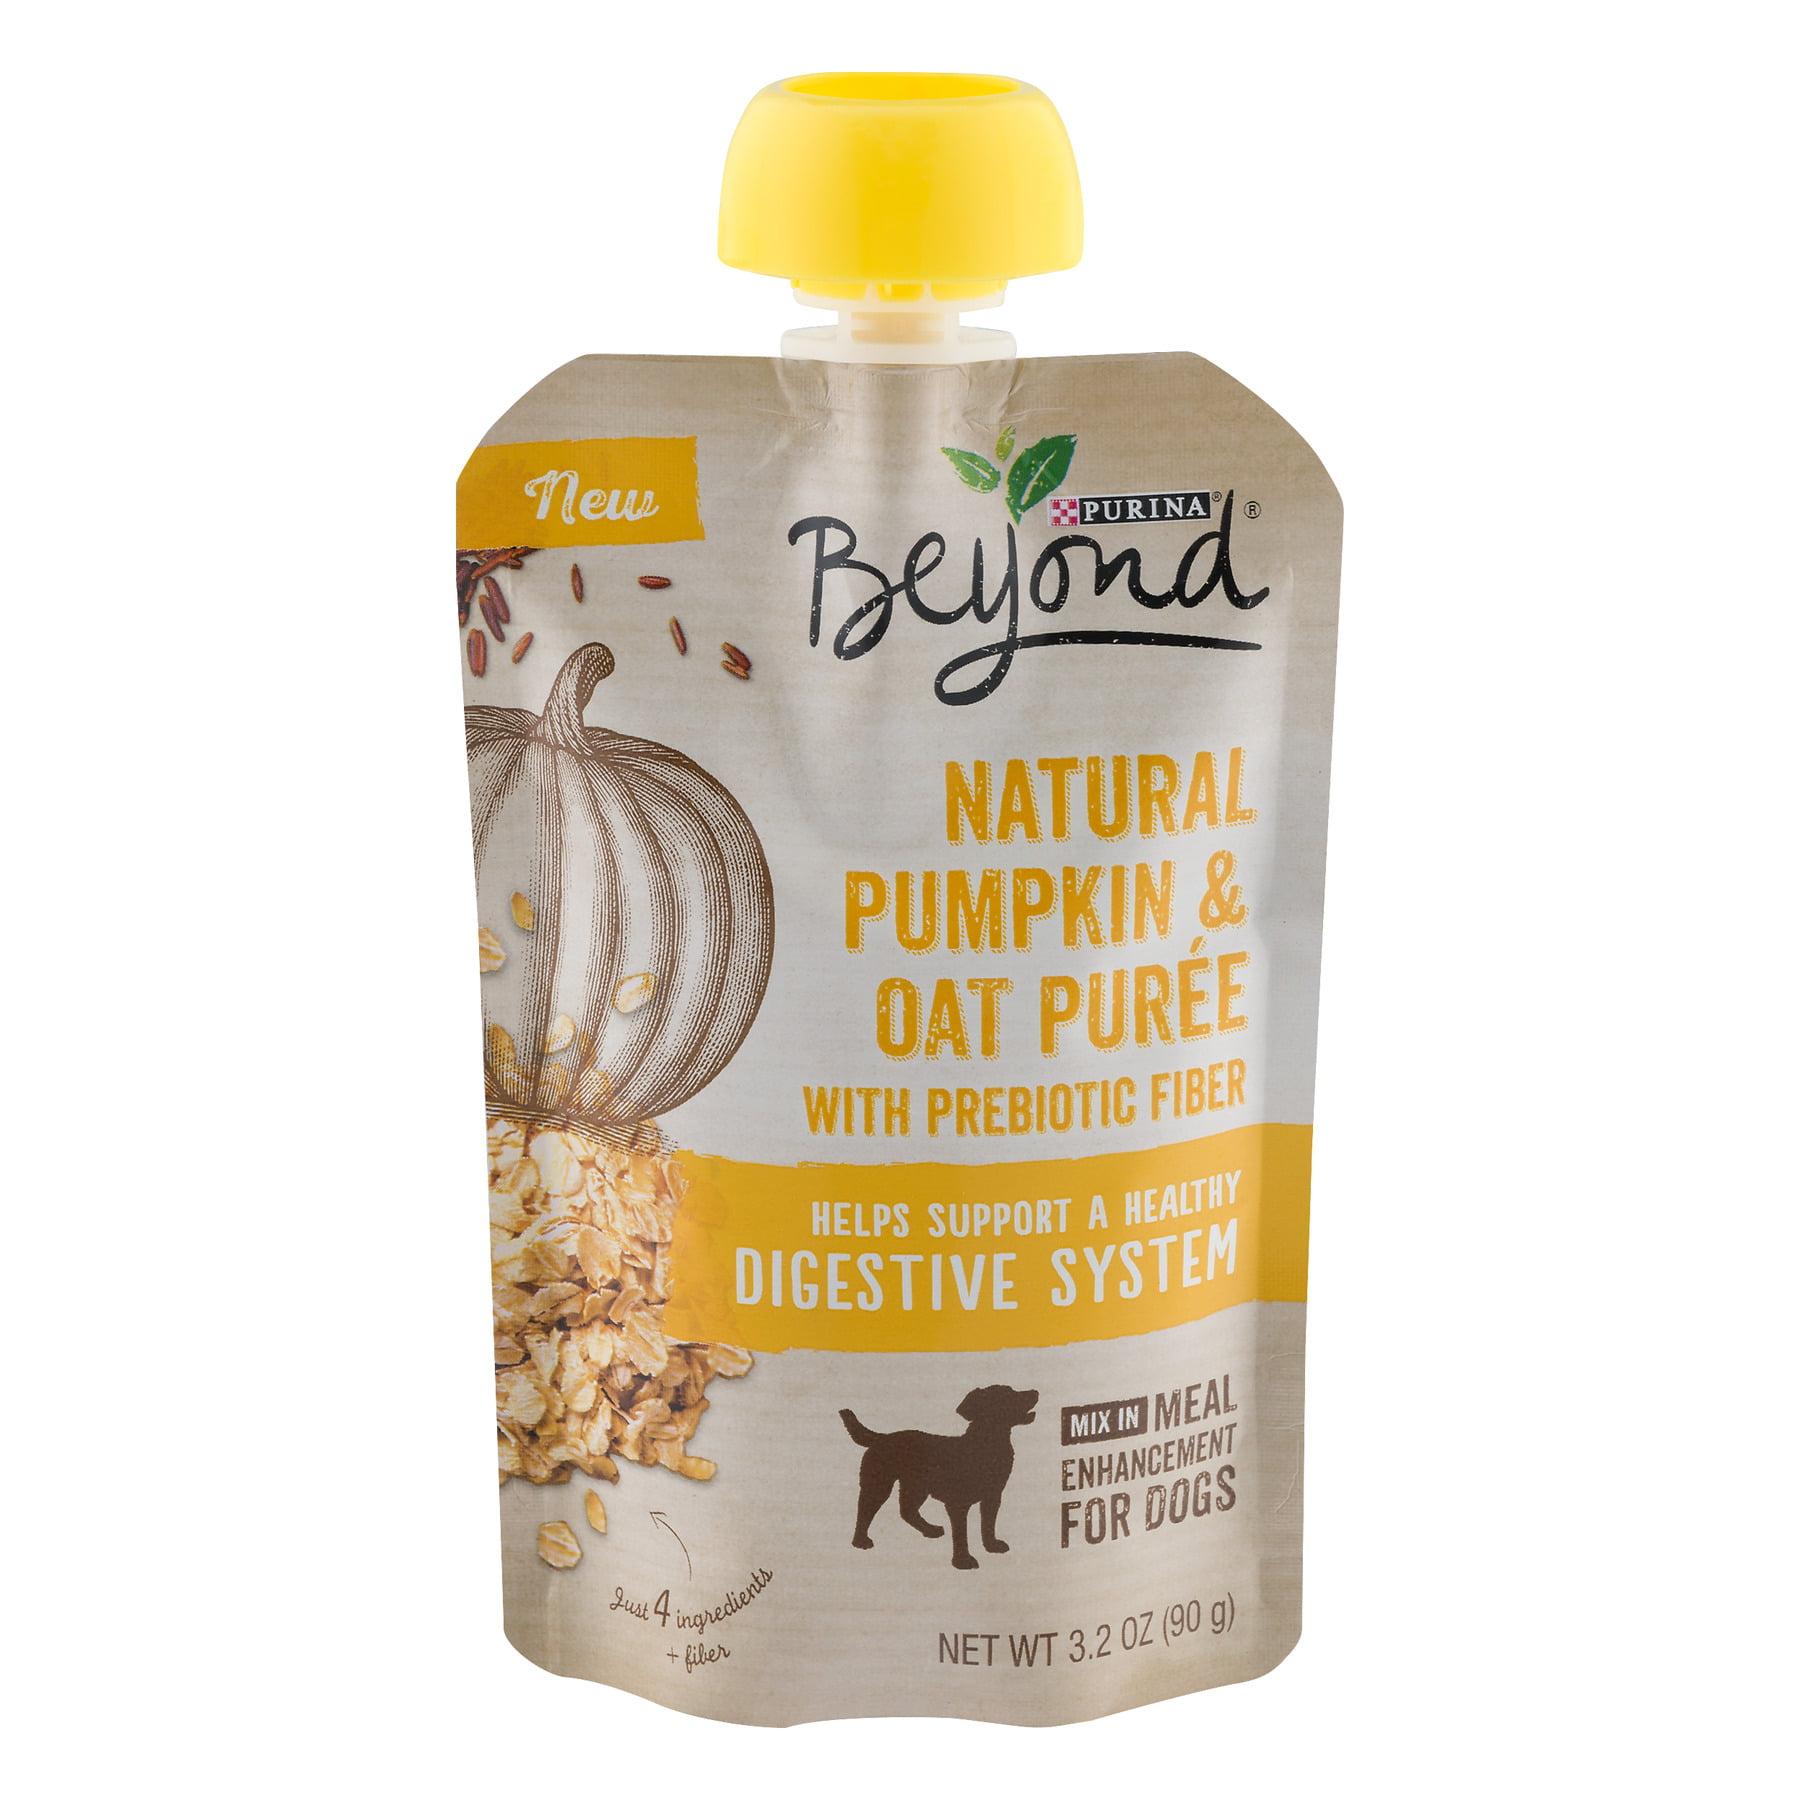 Purina Beyond Natural Pumpkin & Oatmeal Puree With